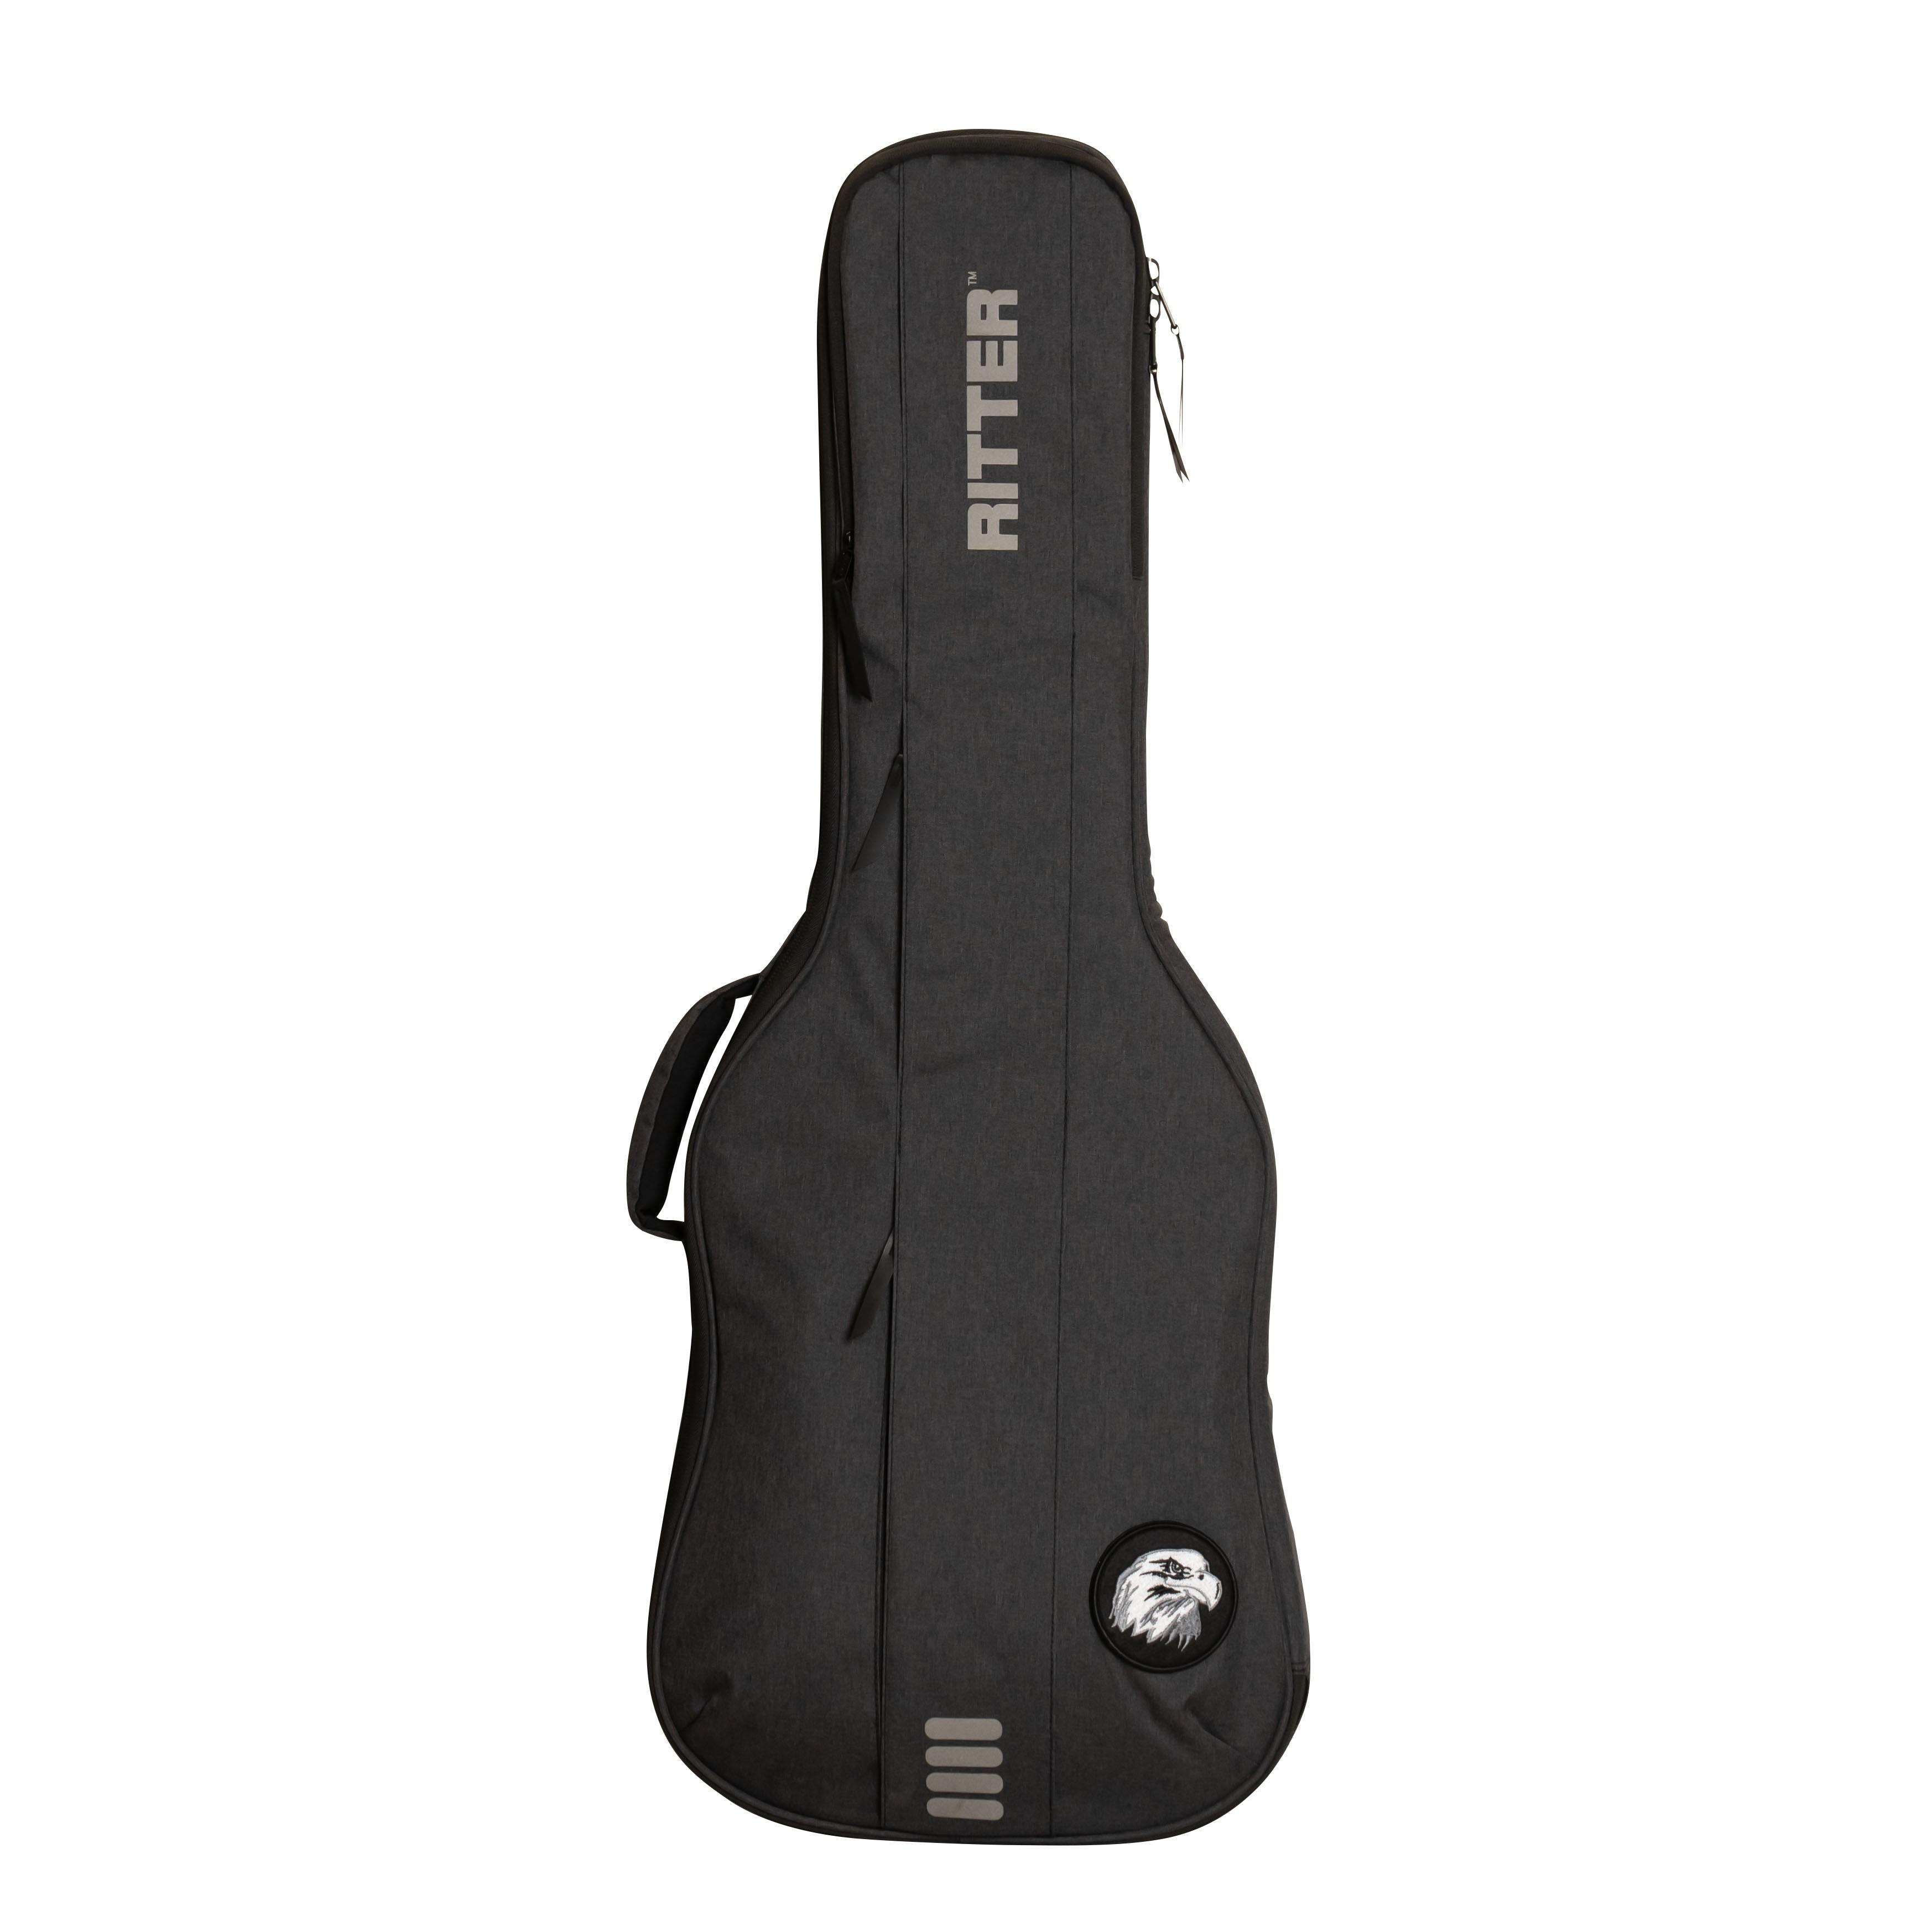 Ritter Bern Electric Bass Guitar Bag - Anthracite (RGB4-B)